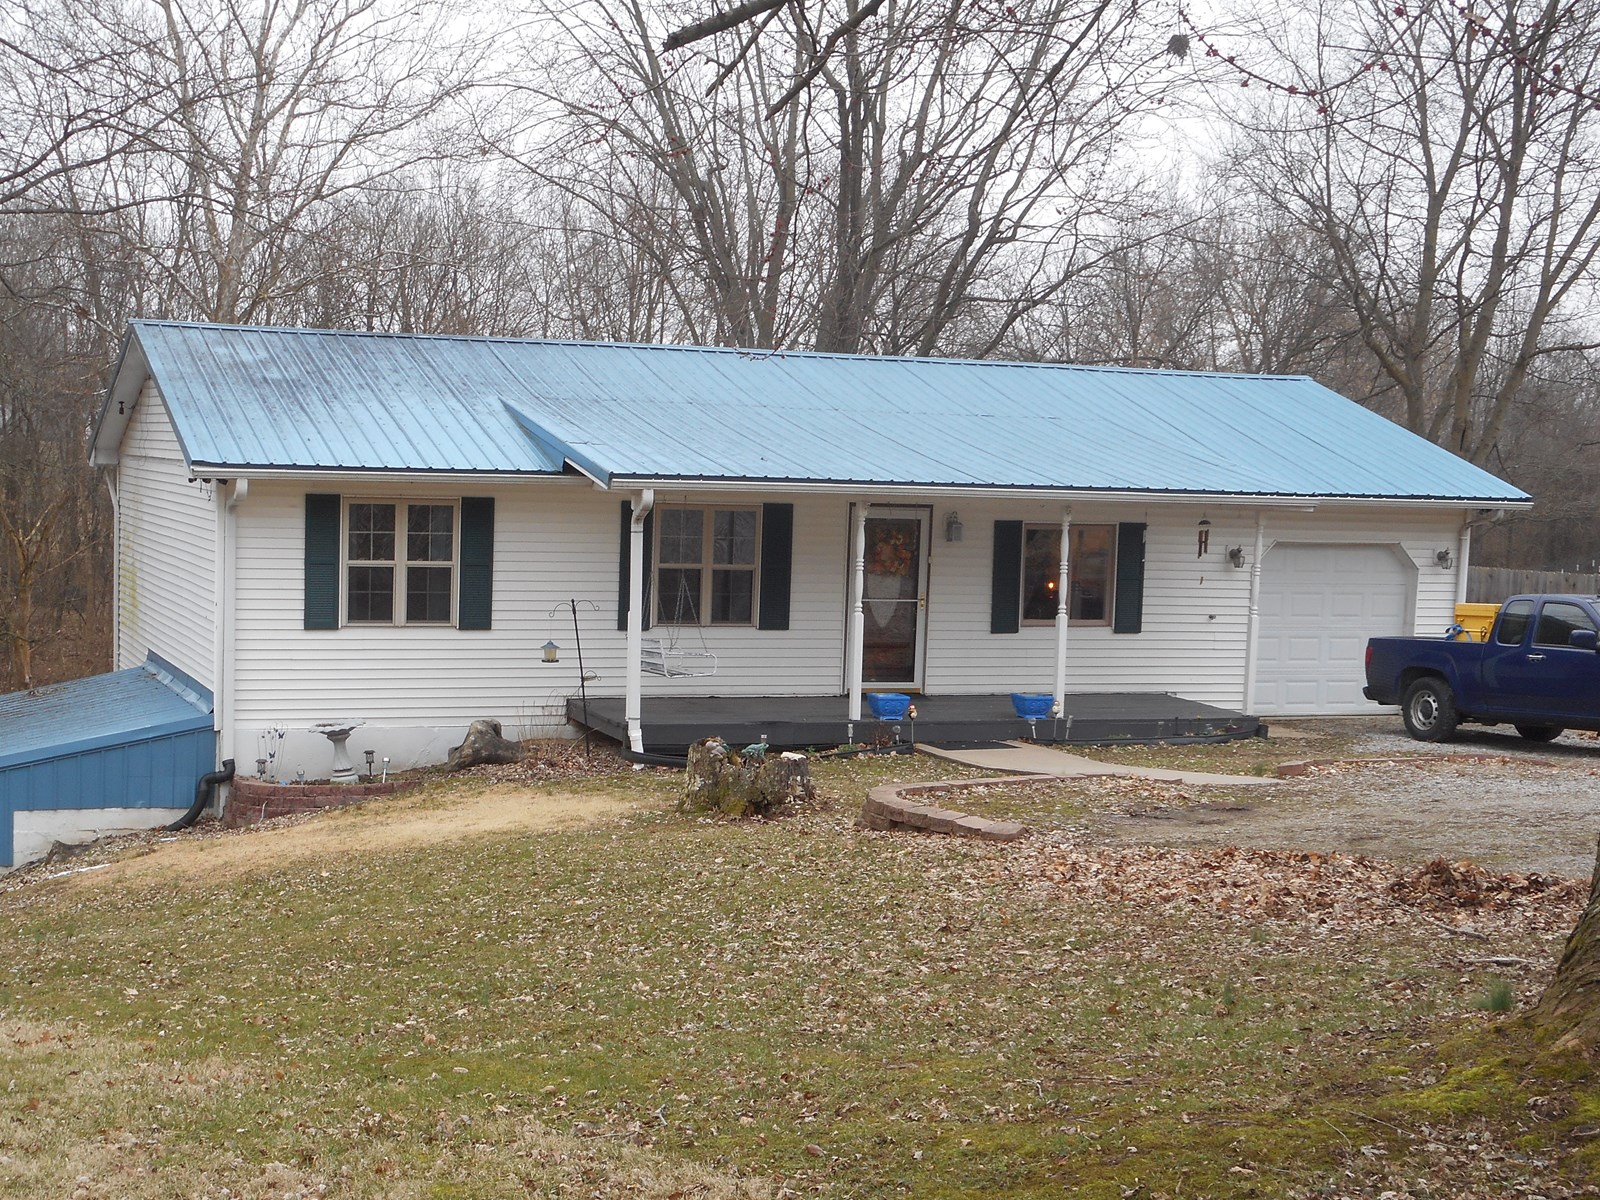 For Sale 3 bedroom, 2.5 bath & finished basement Jackson MO